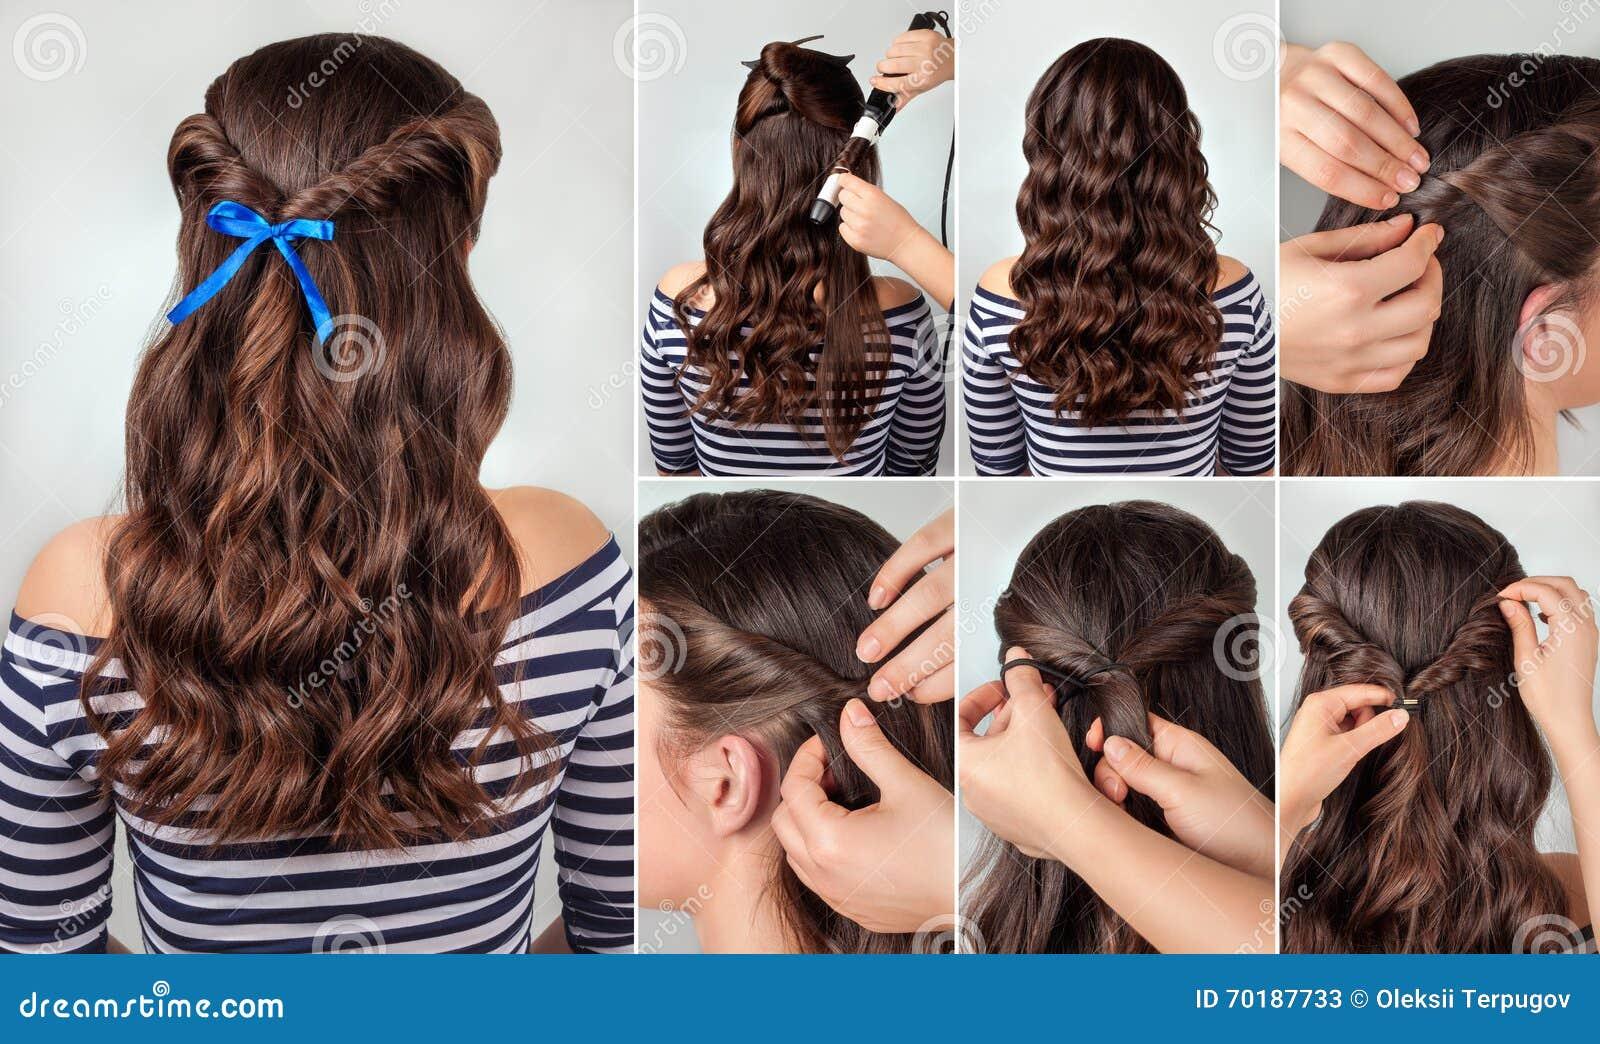 Awe Inspiring Hairstyle Curly Hair Tutorial Stock Photo Image 70382918 Hairstyles For Women Draintrainus